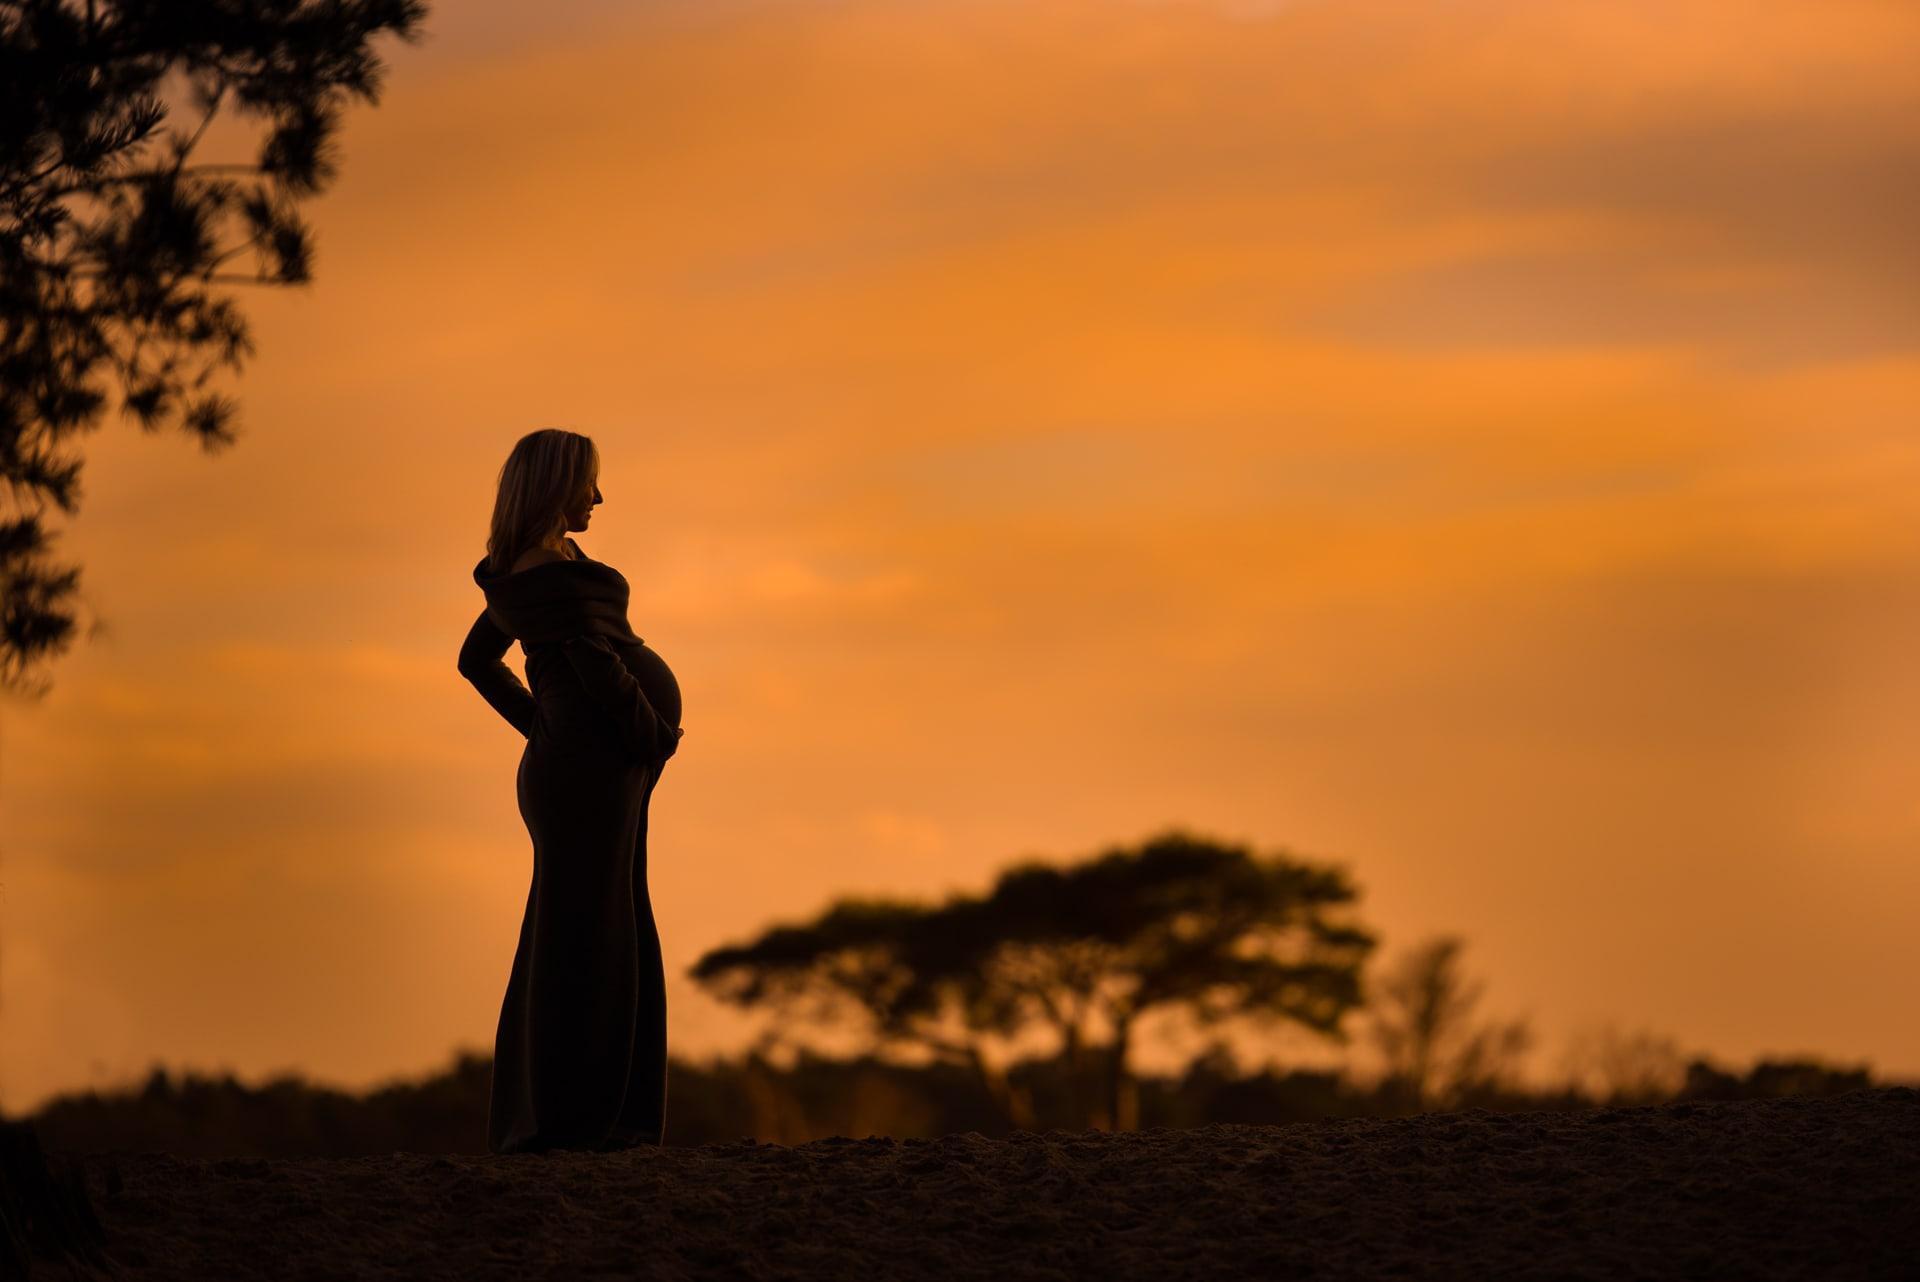 Zwangere vrouw silhouet in avondzon